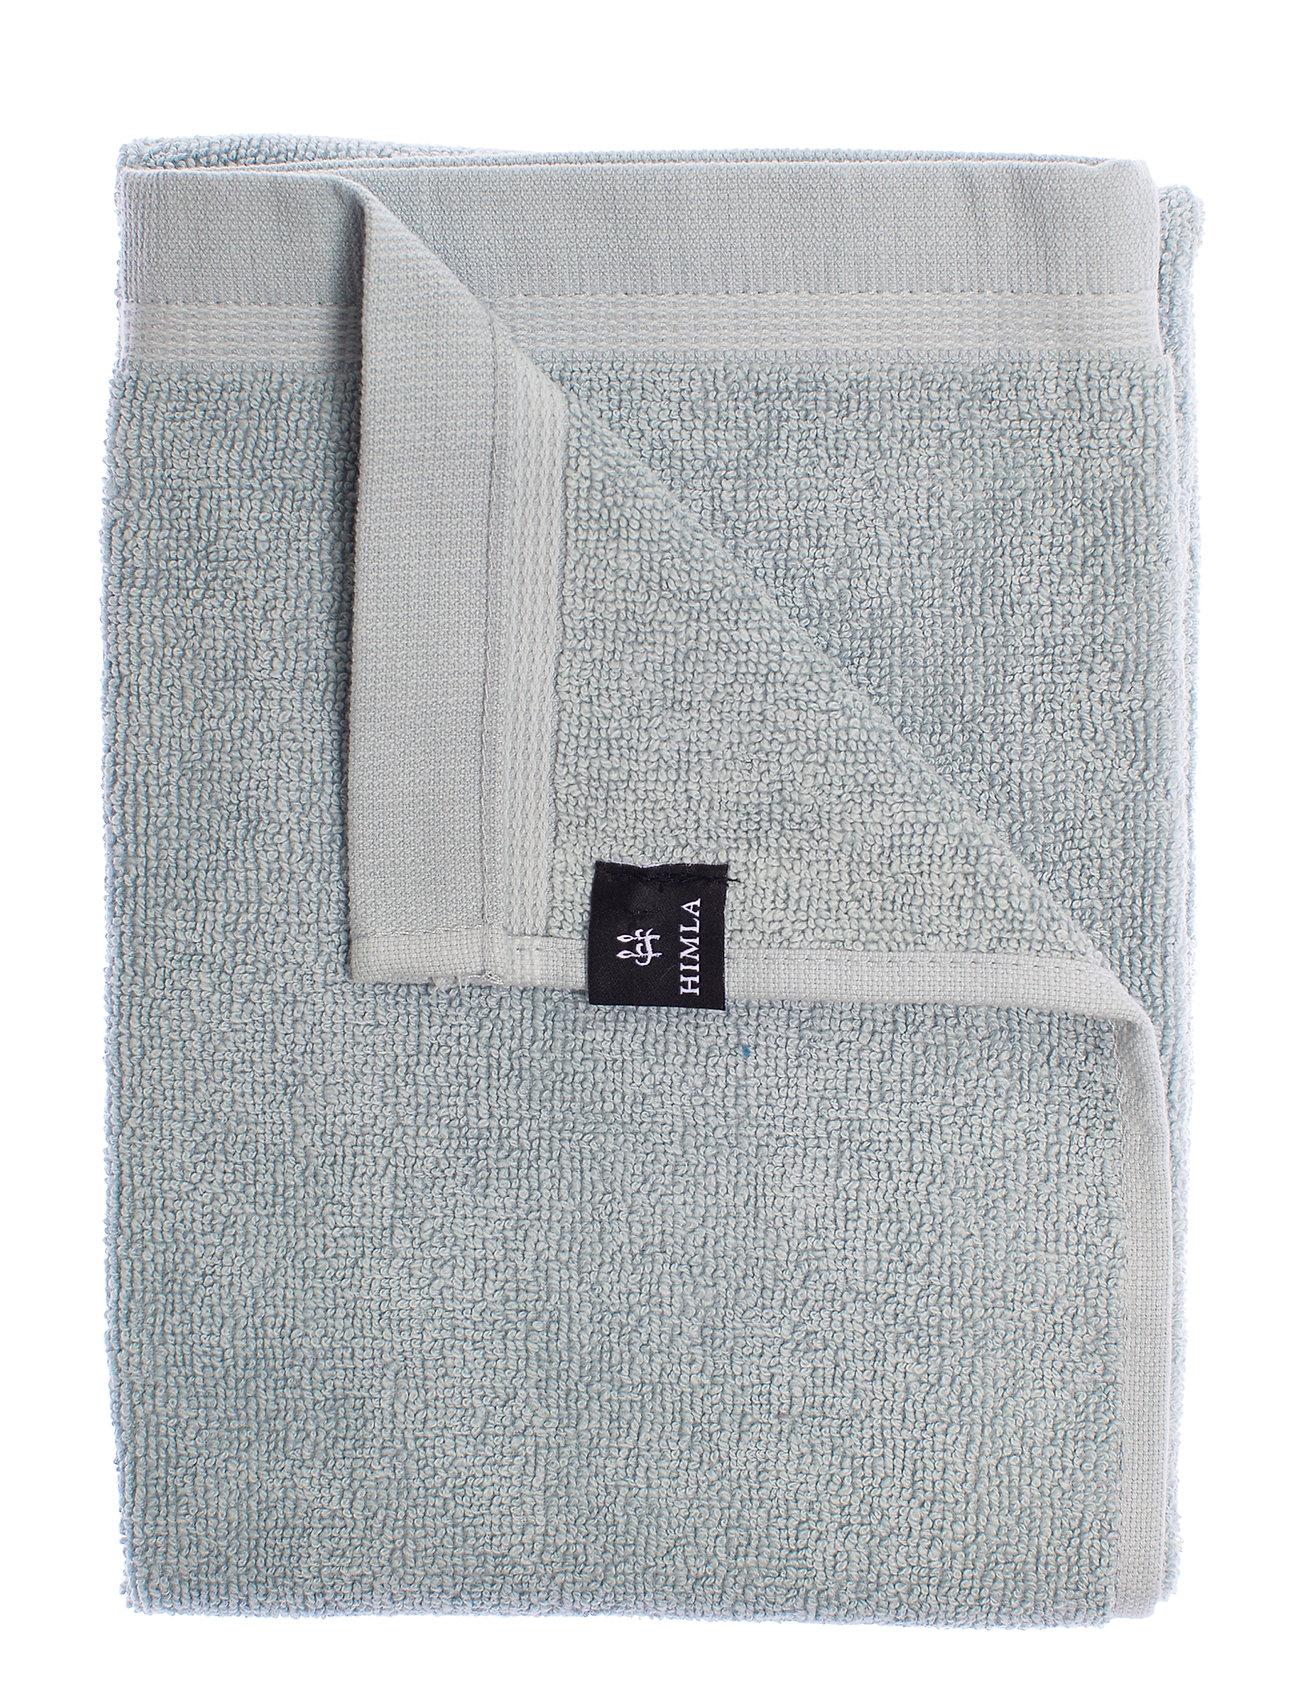 Himla Lina towel - COOL